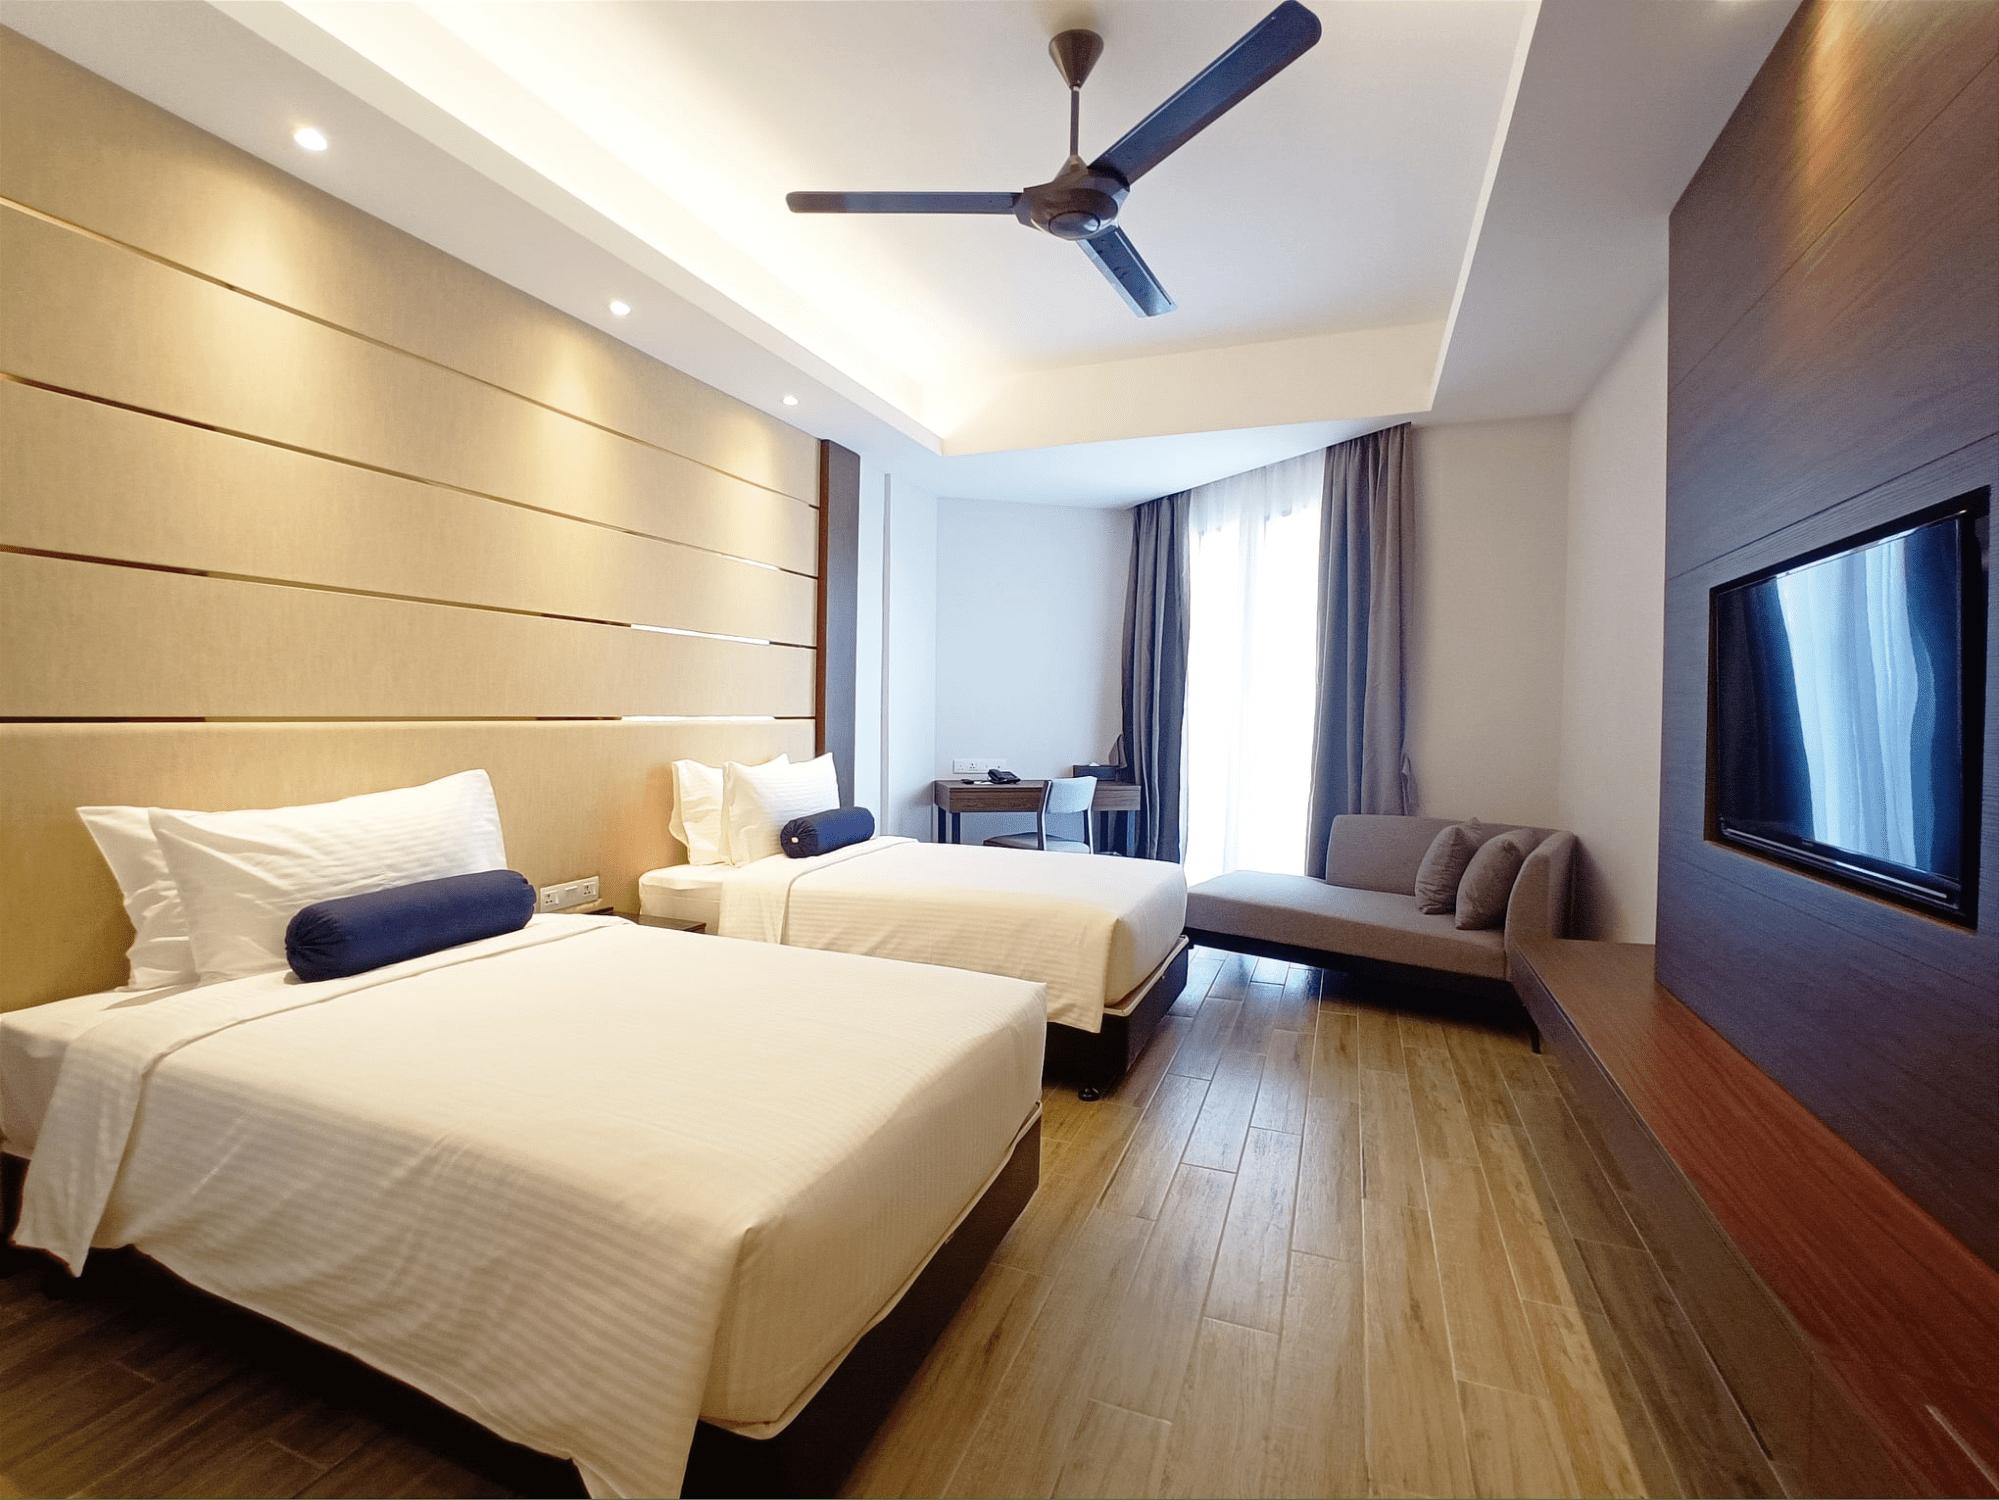 Pacific Regency Beach Resort In Port Dickson - room